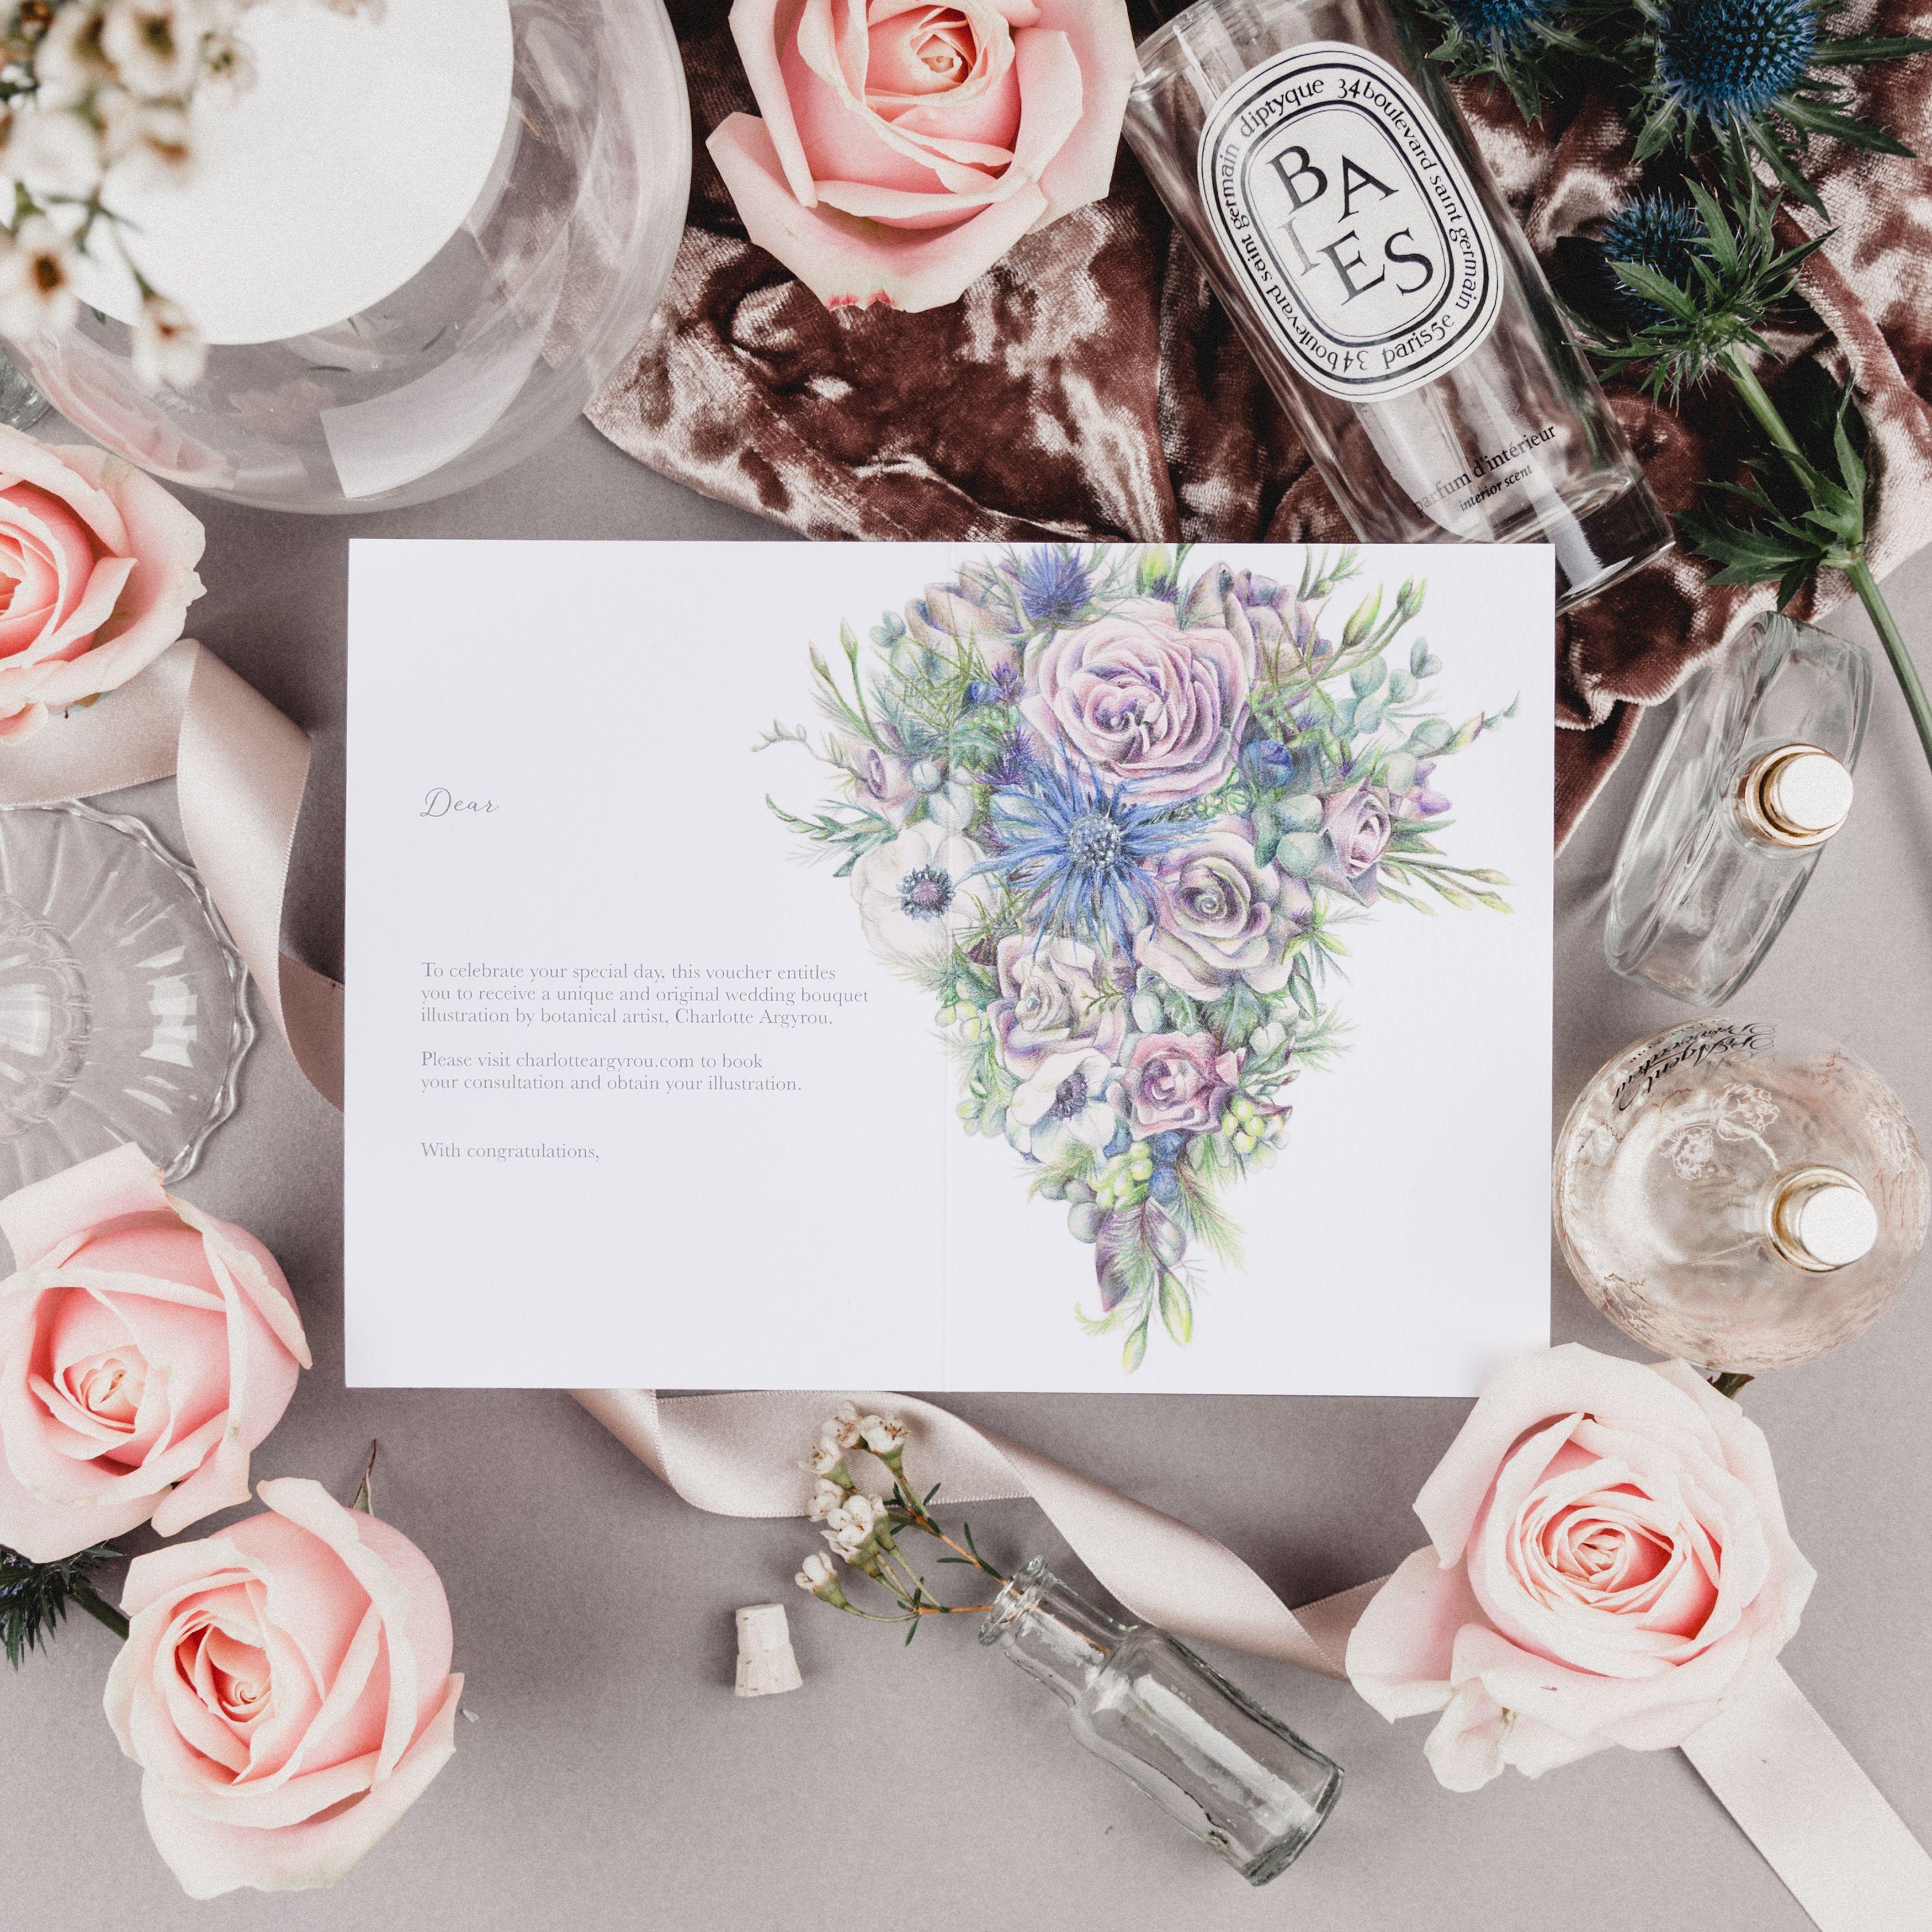 Wedding Bouquet Illustration Service gift voucher by botanical ...